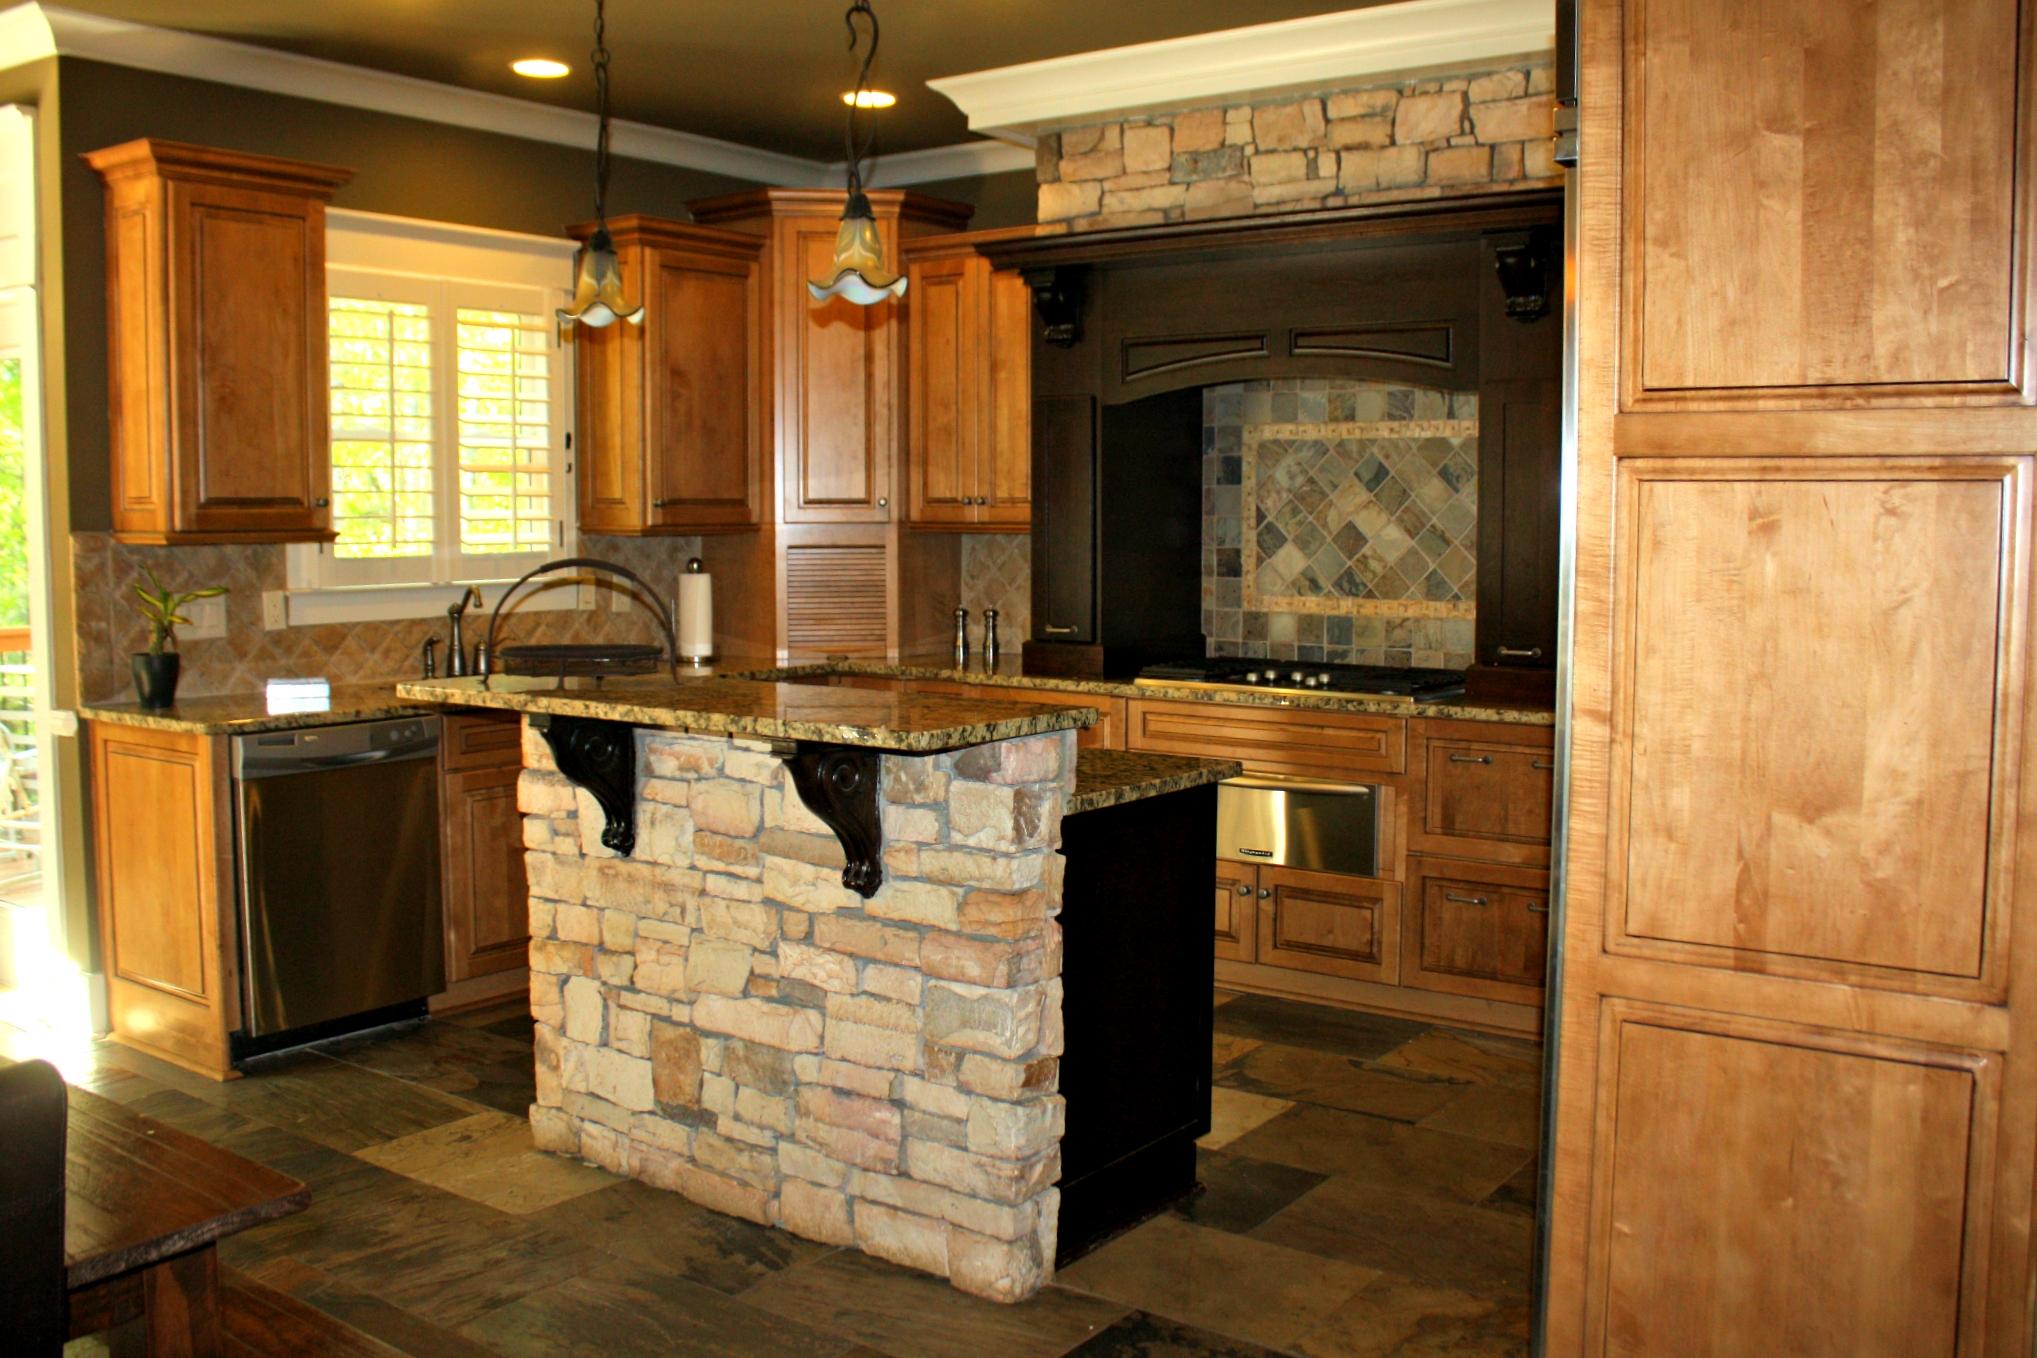 Fouts kitchen6544.JPG